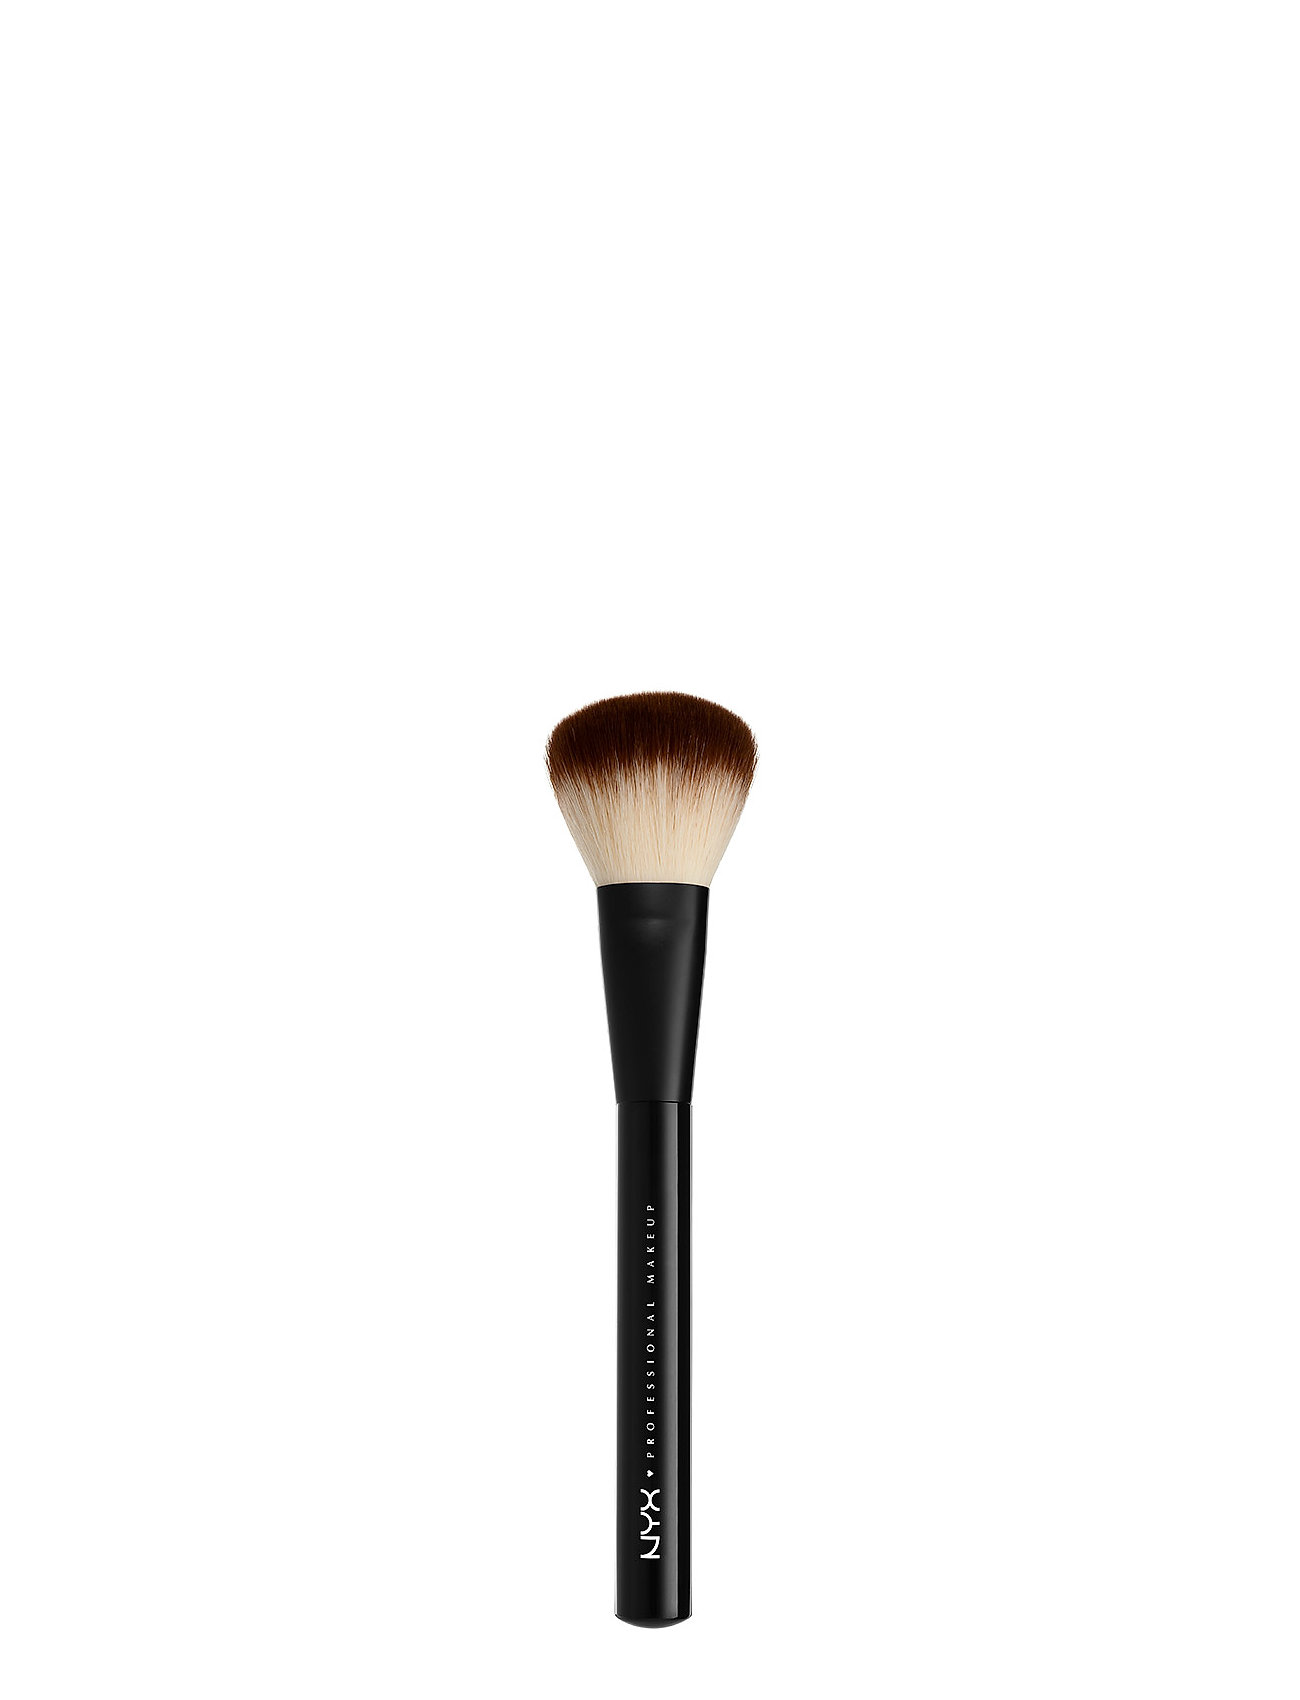 Image of Pro Powder Brush Beauty WOMEN Makeup Makeup Brushes Face Brushes Nude NYX PROFESSIONAL MAKEUP (3408638977)